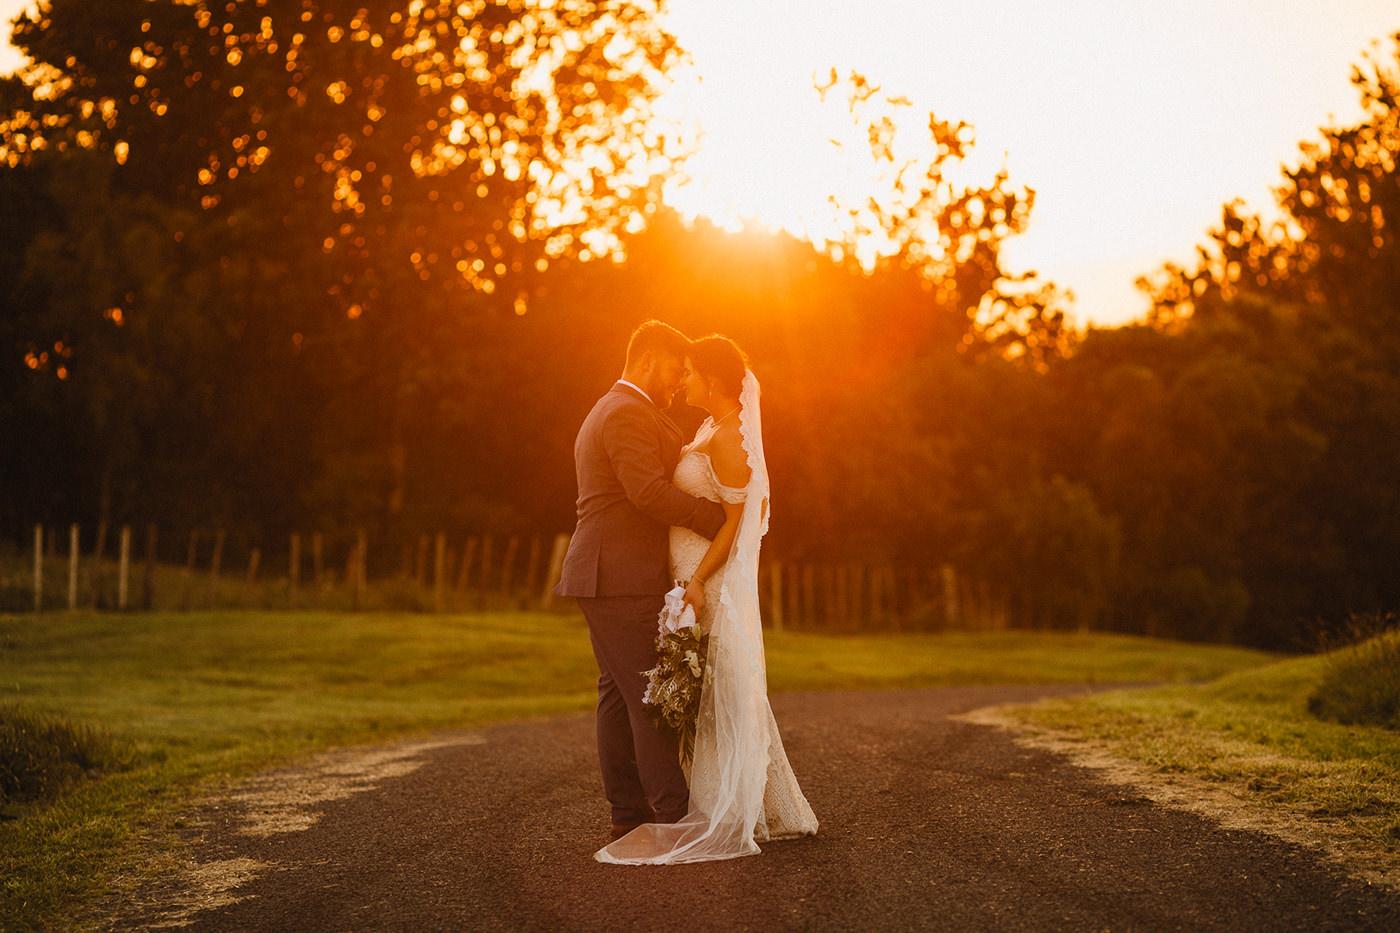 wedding_photographer_nz-00028.jpg